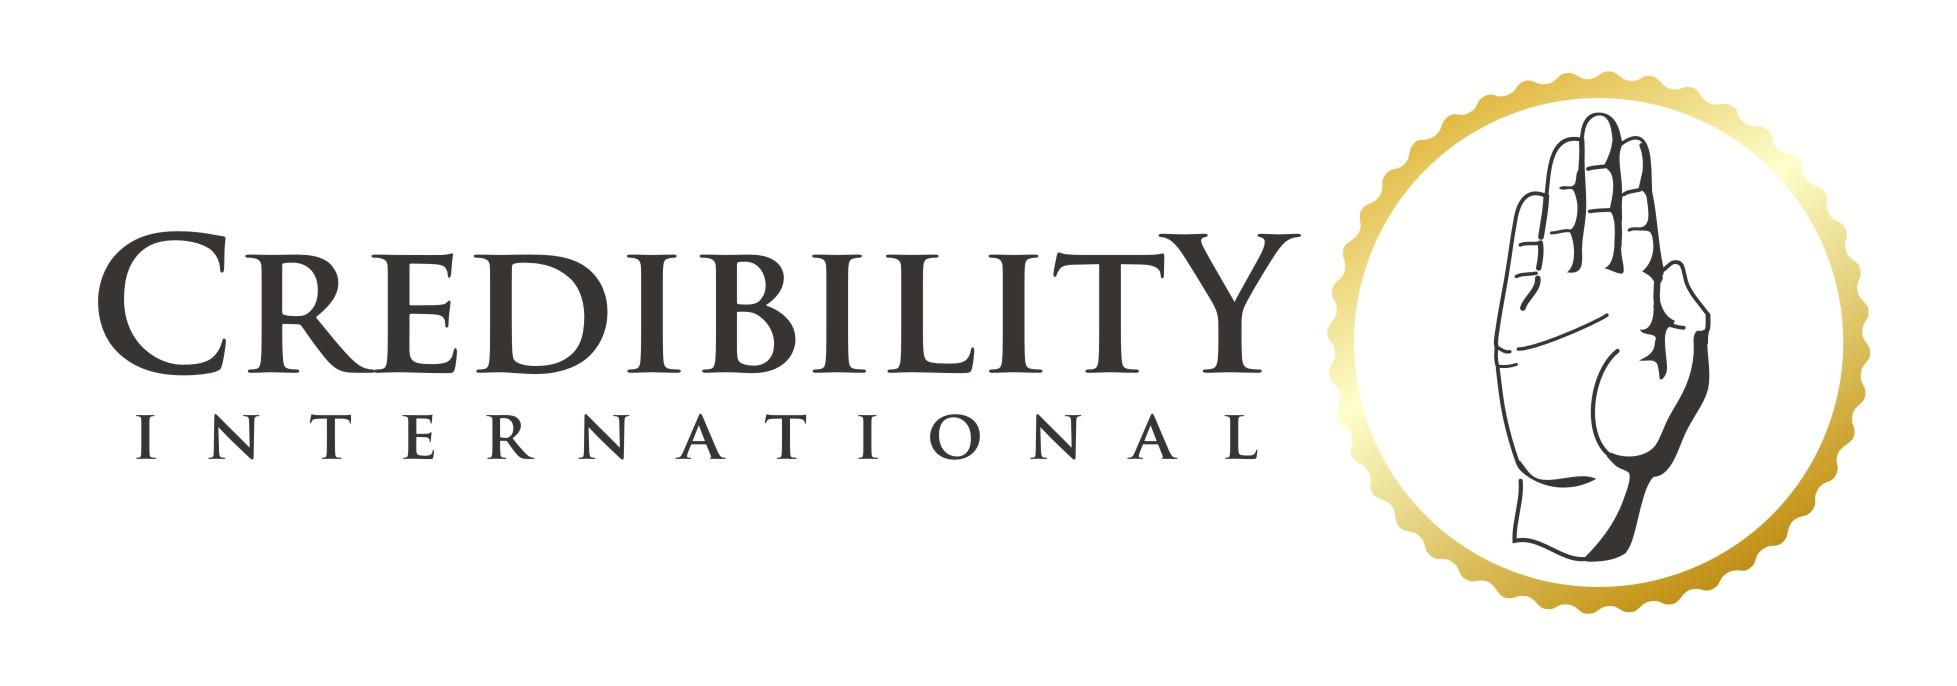 Credibility International